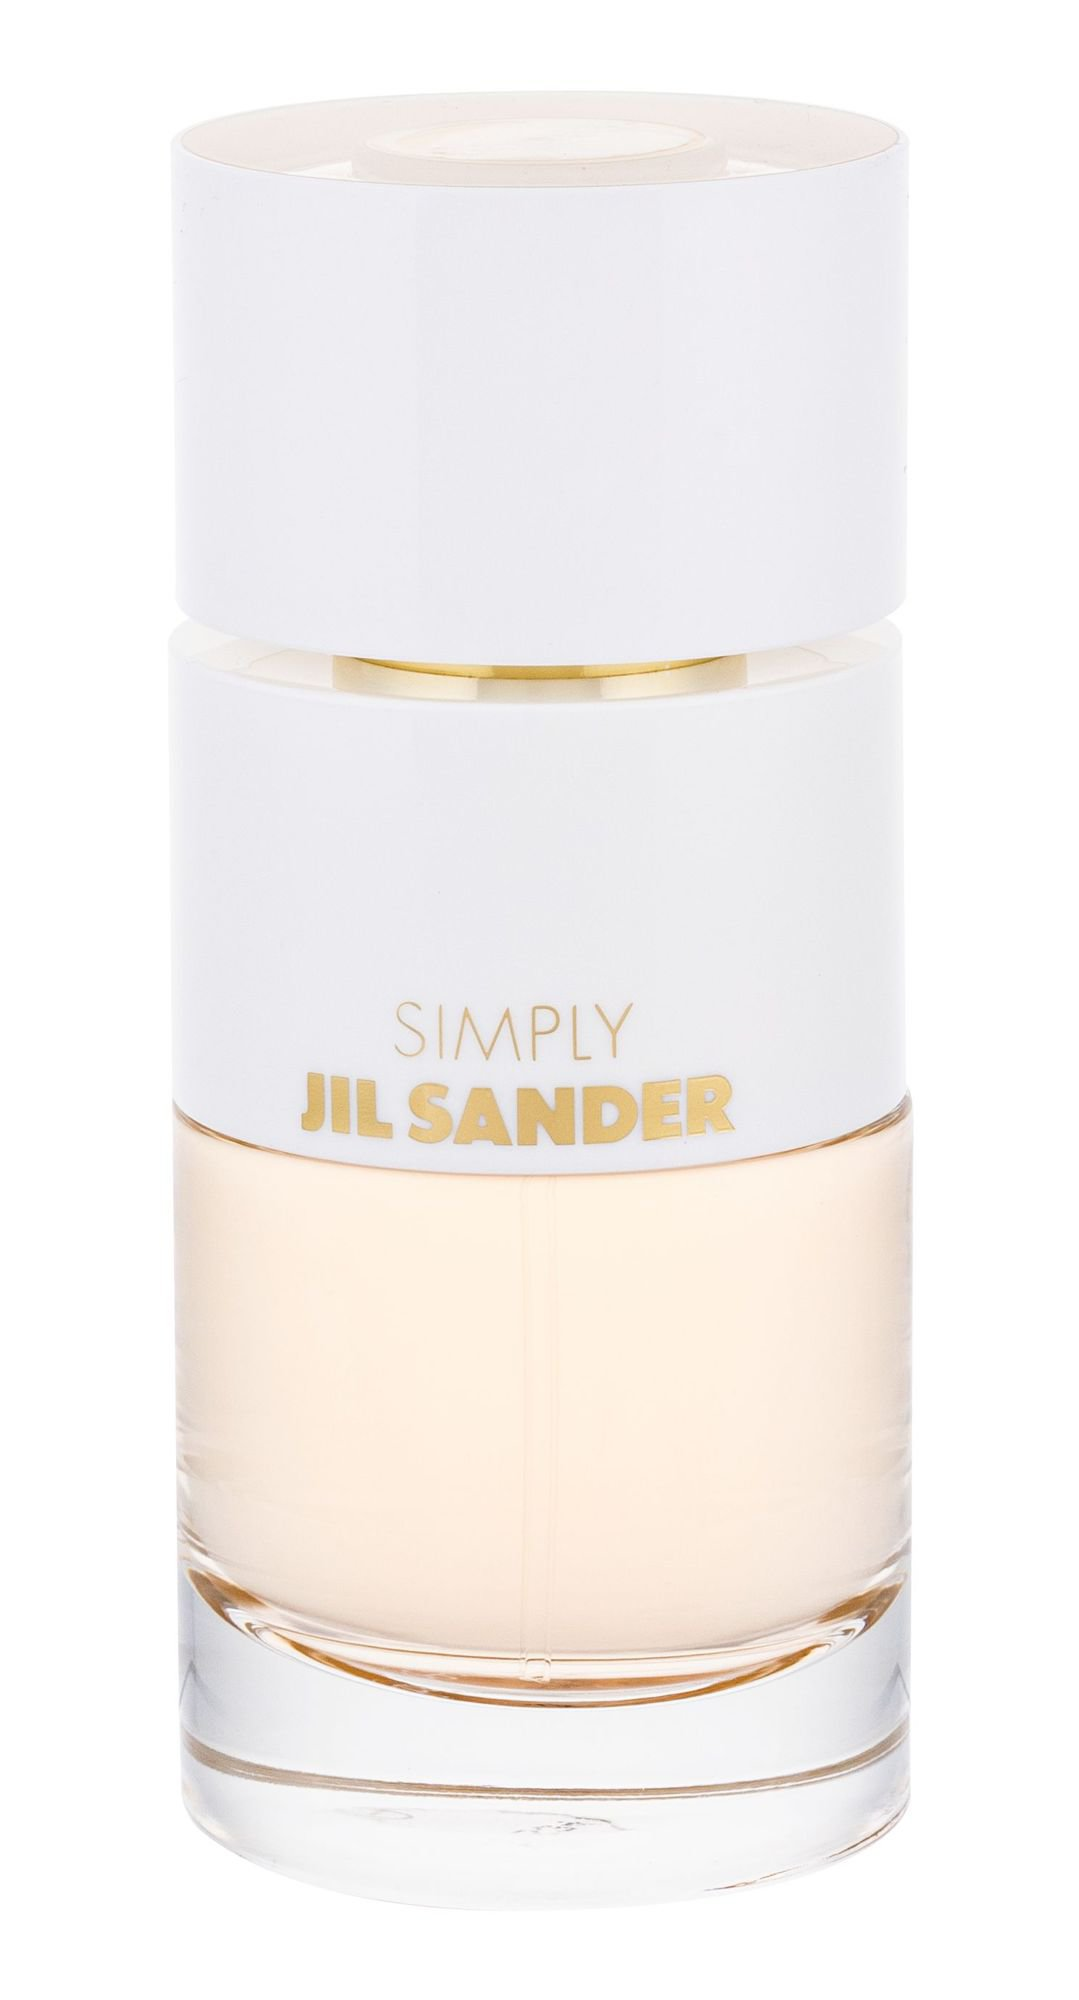 Jil Sander Simply Jil Sander, edt 60ml - Teszter